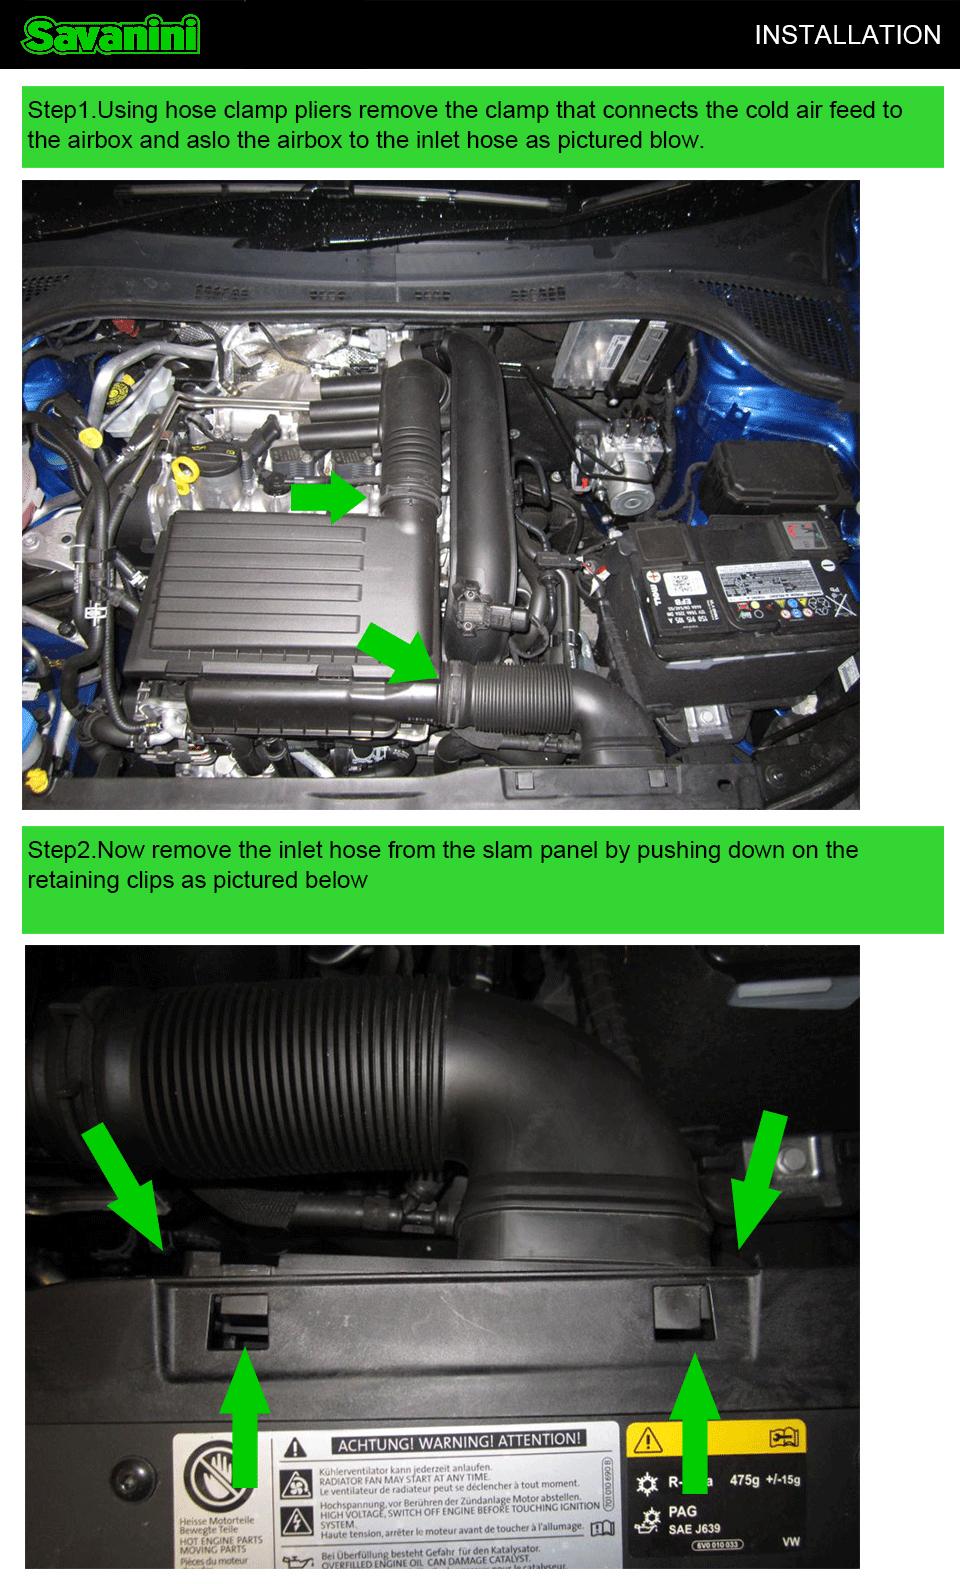 Savanini High-quality Dump Blow Off Valve Kit For Vw Golf Mk7 And ...